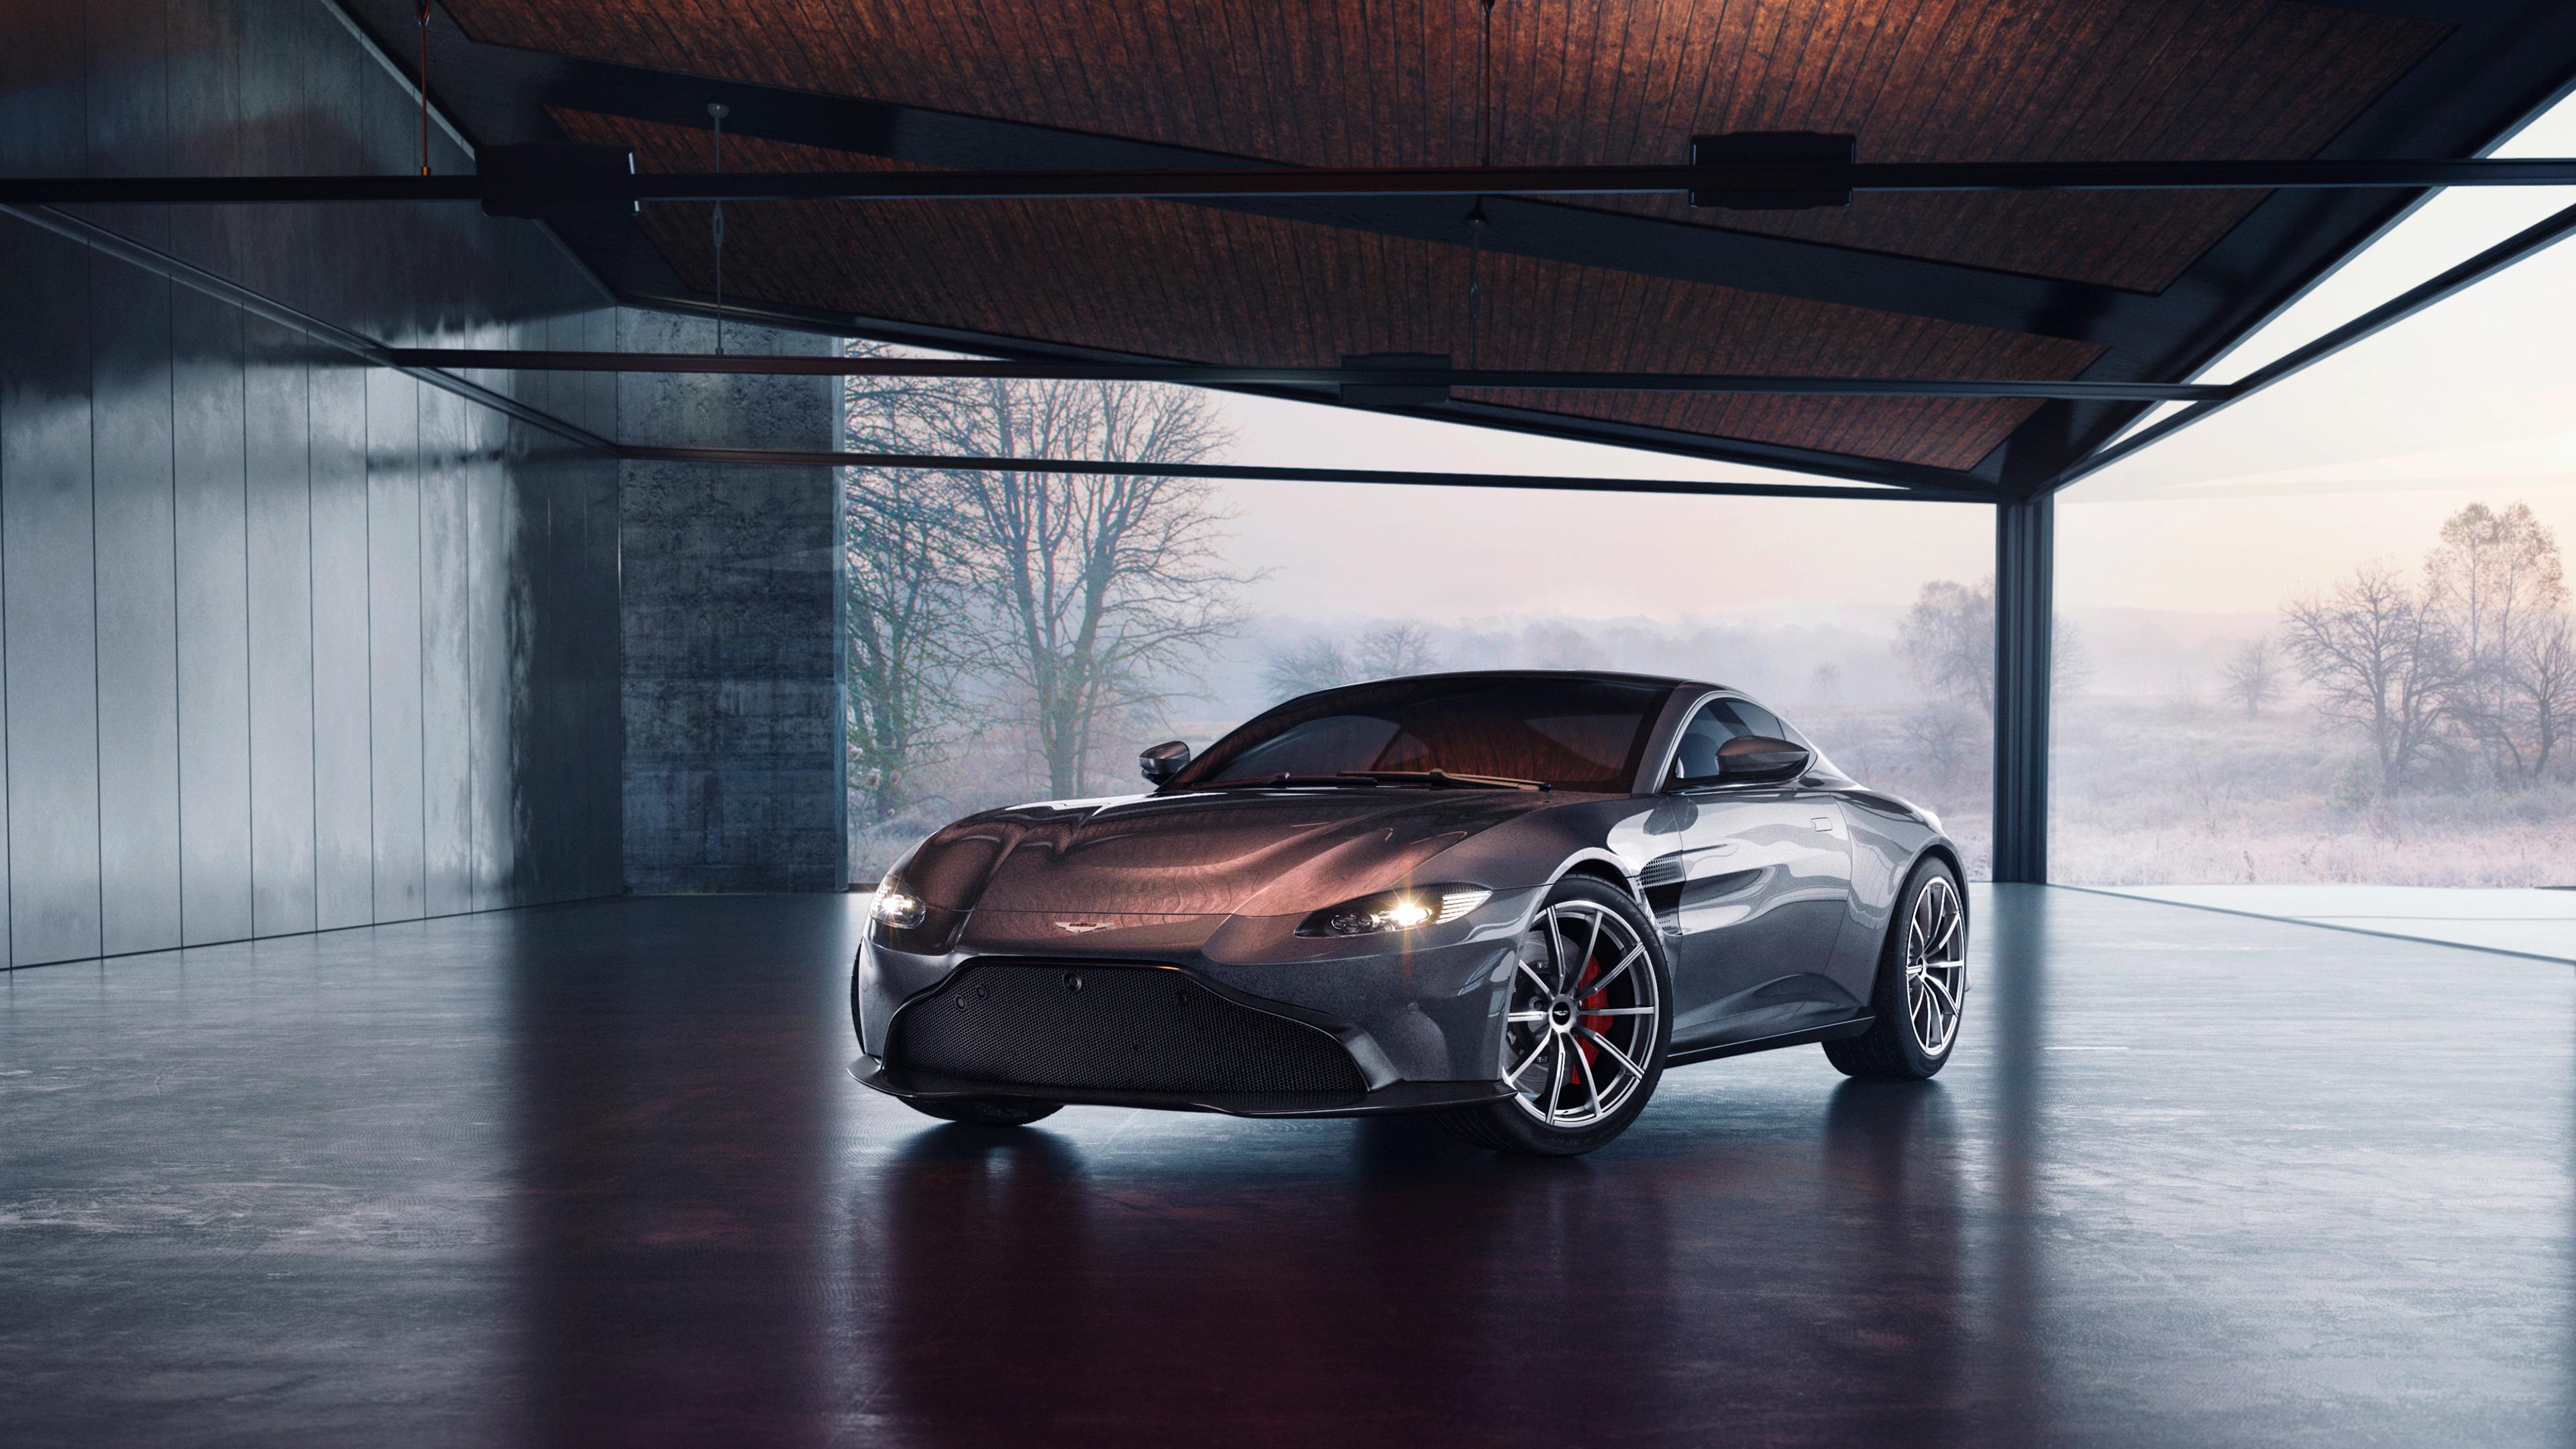 aston martin vantage front 1559764663 - Aston Martin Vantage Front - hd-wallpapers, behance wallpapers, aston martin wallpapers, aston martin vantage wallpapers, 4k-wallpapers, 2019 cars wallpapers